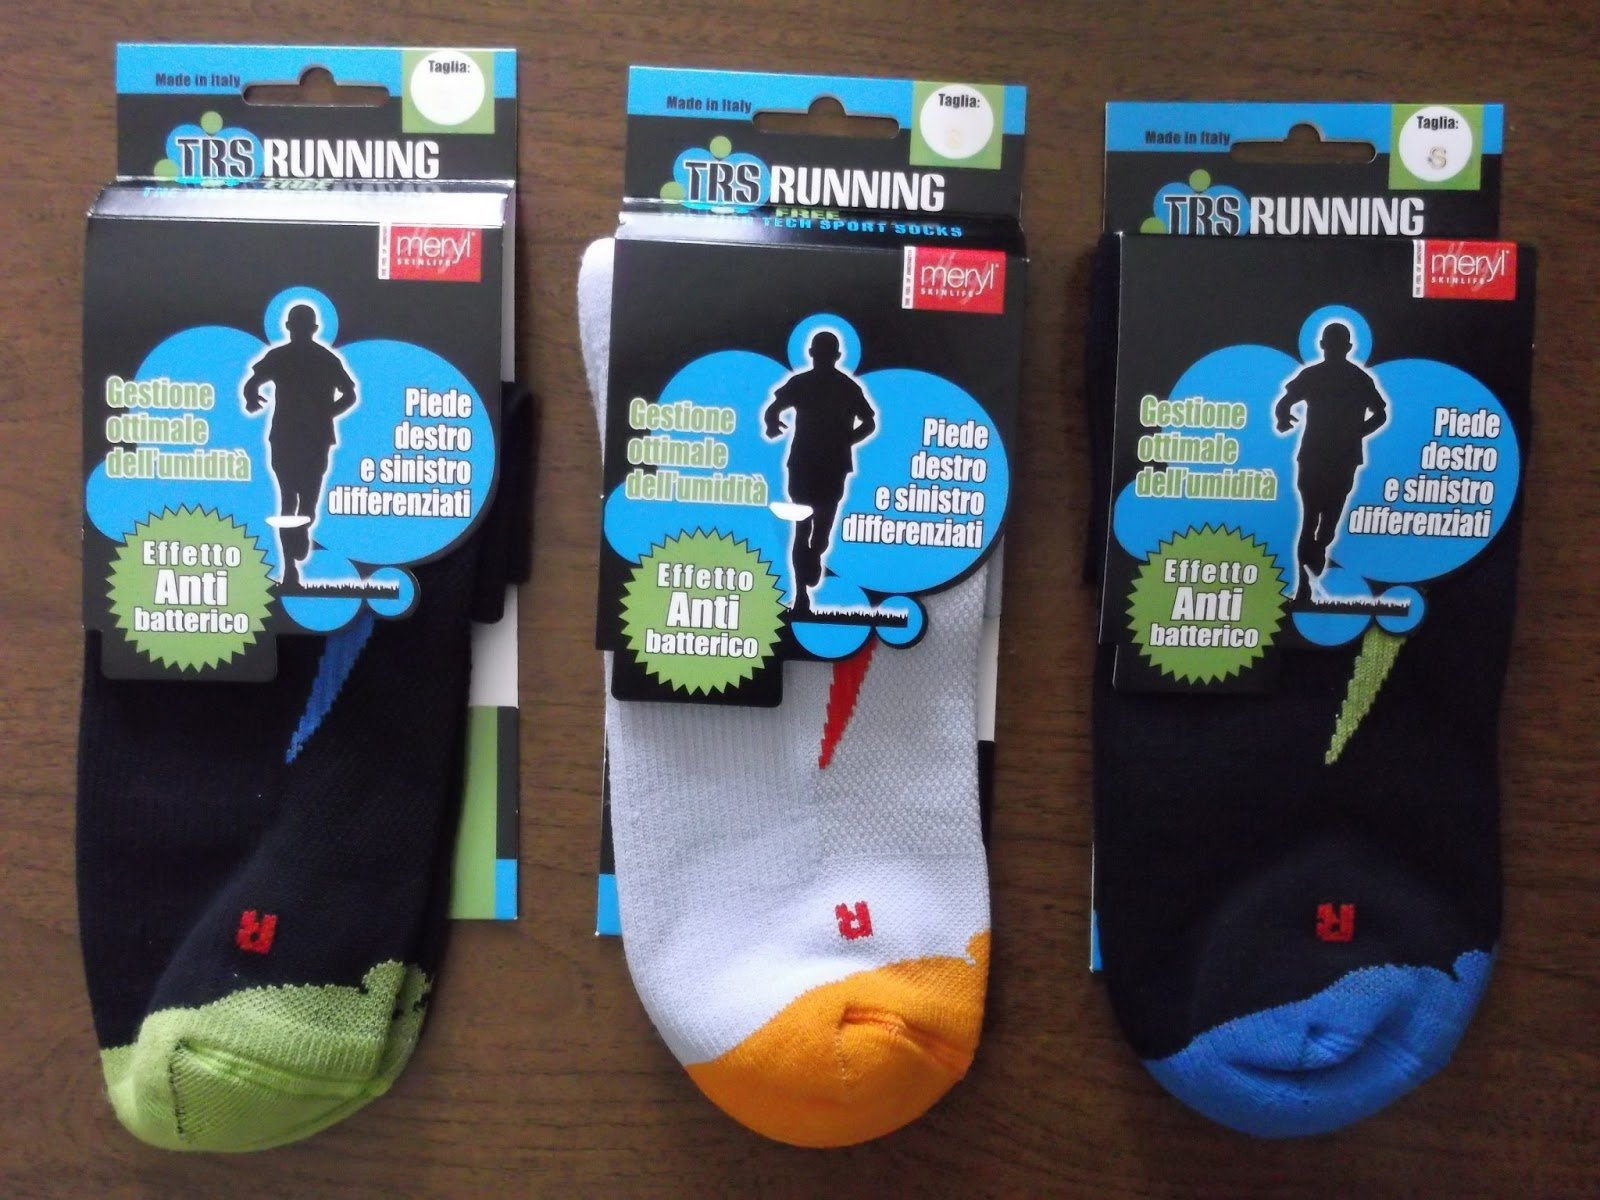 Foto di calzini per il running